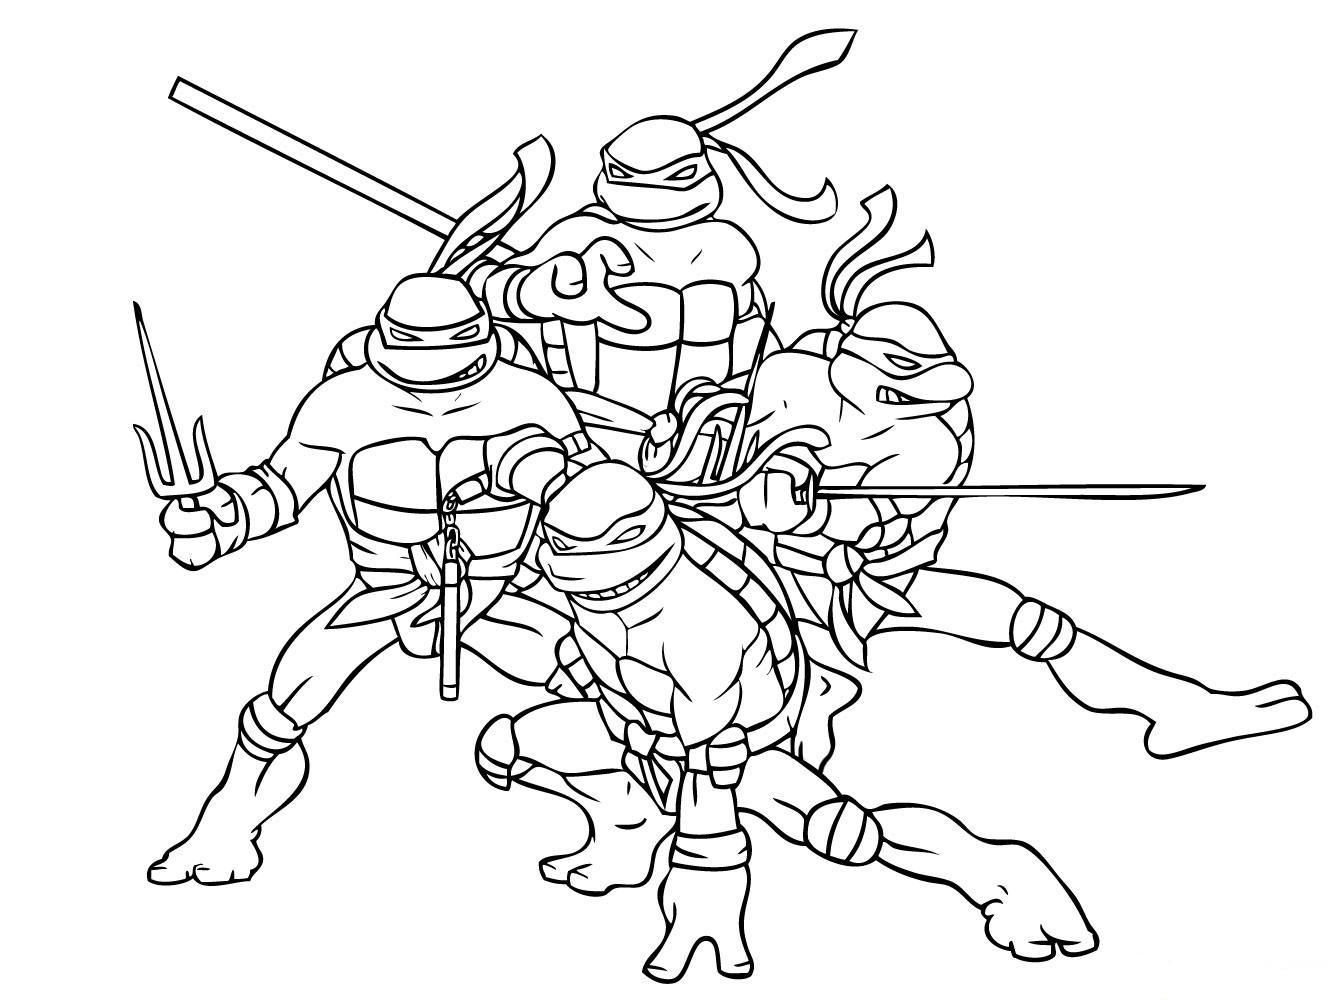 Download and print superhero coloring page ninja turtle free